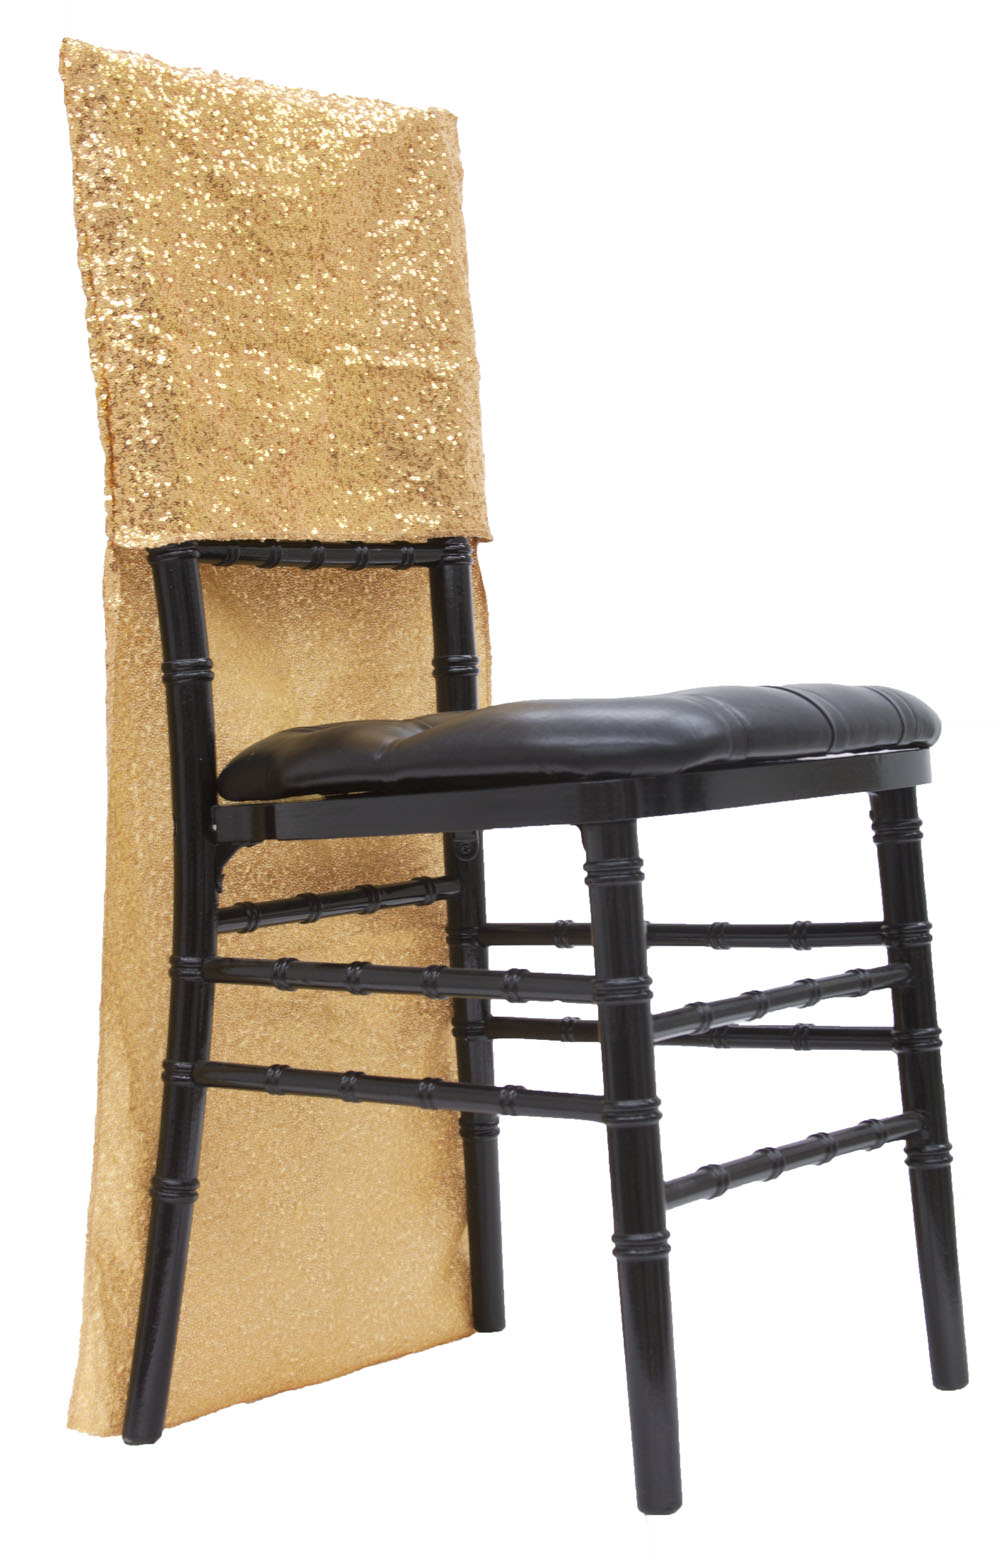 Návlek na chiavary stoličku - Obrázok č. 3